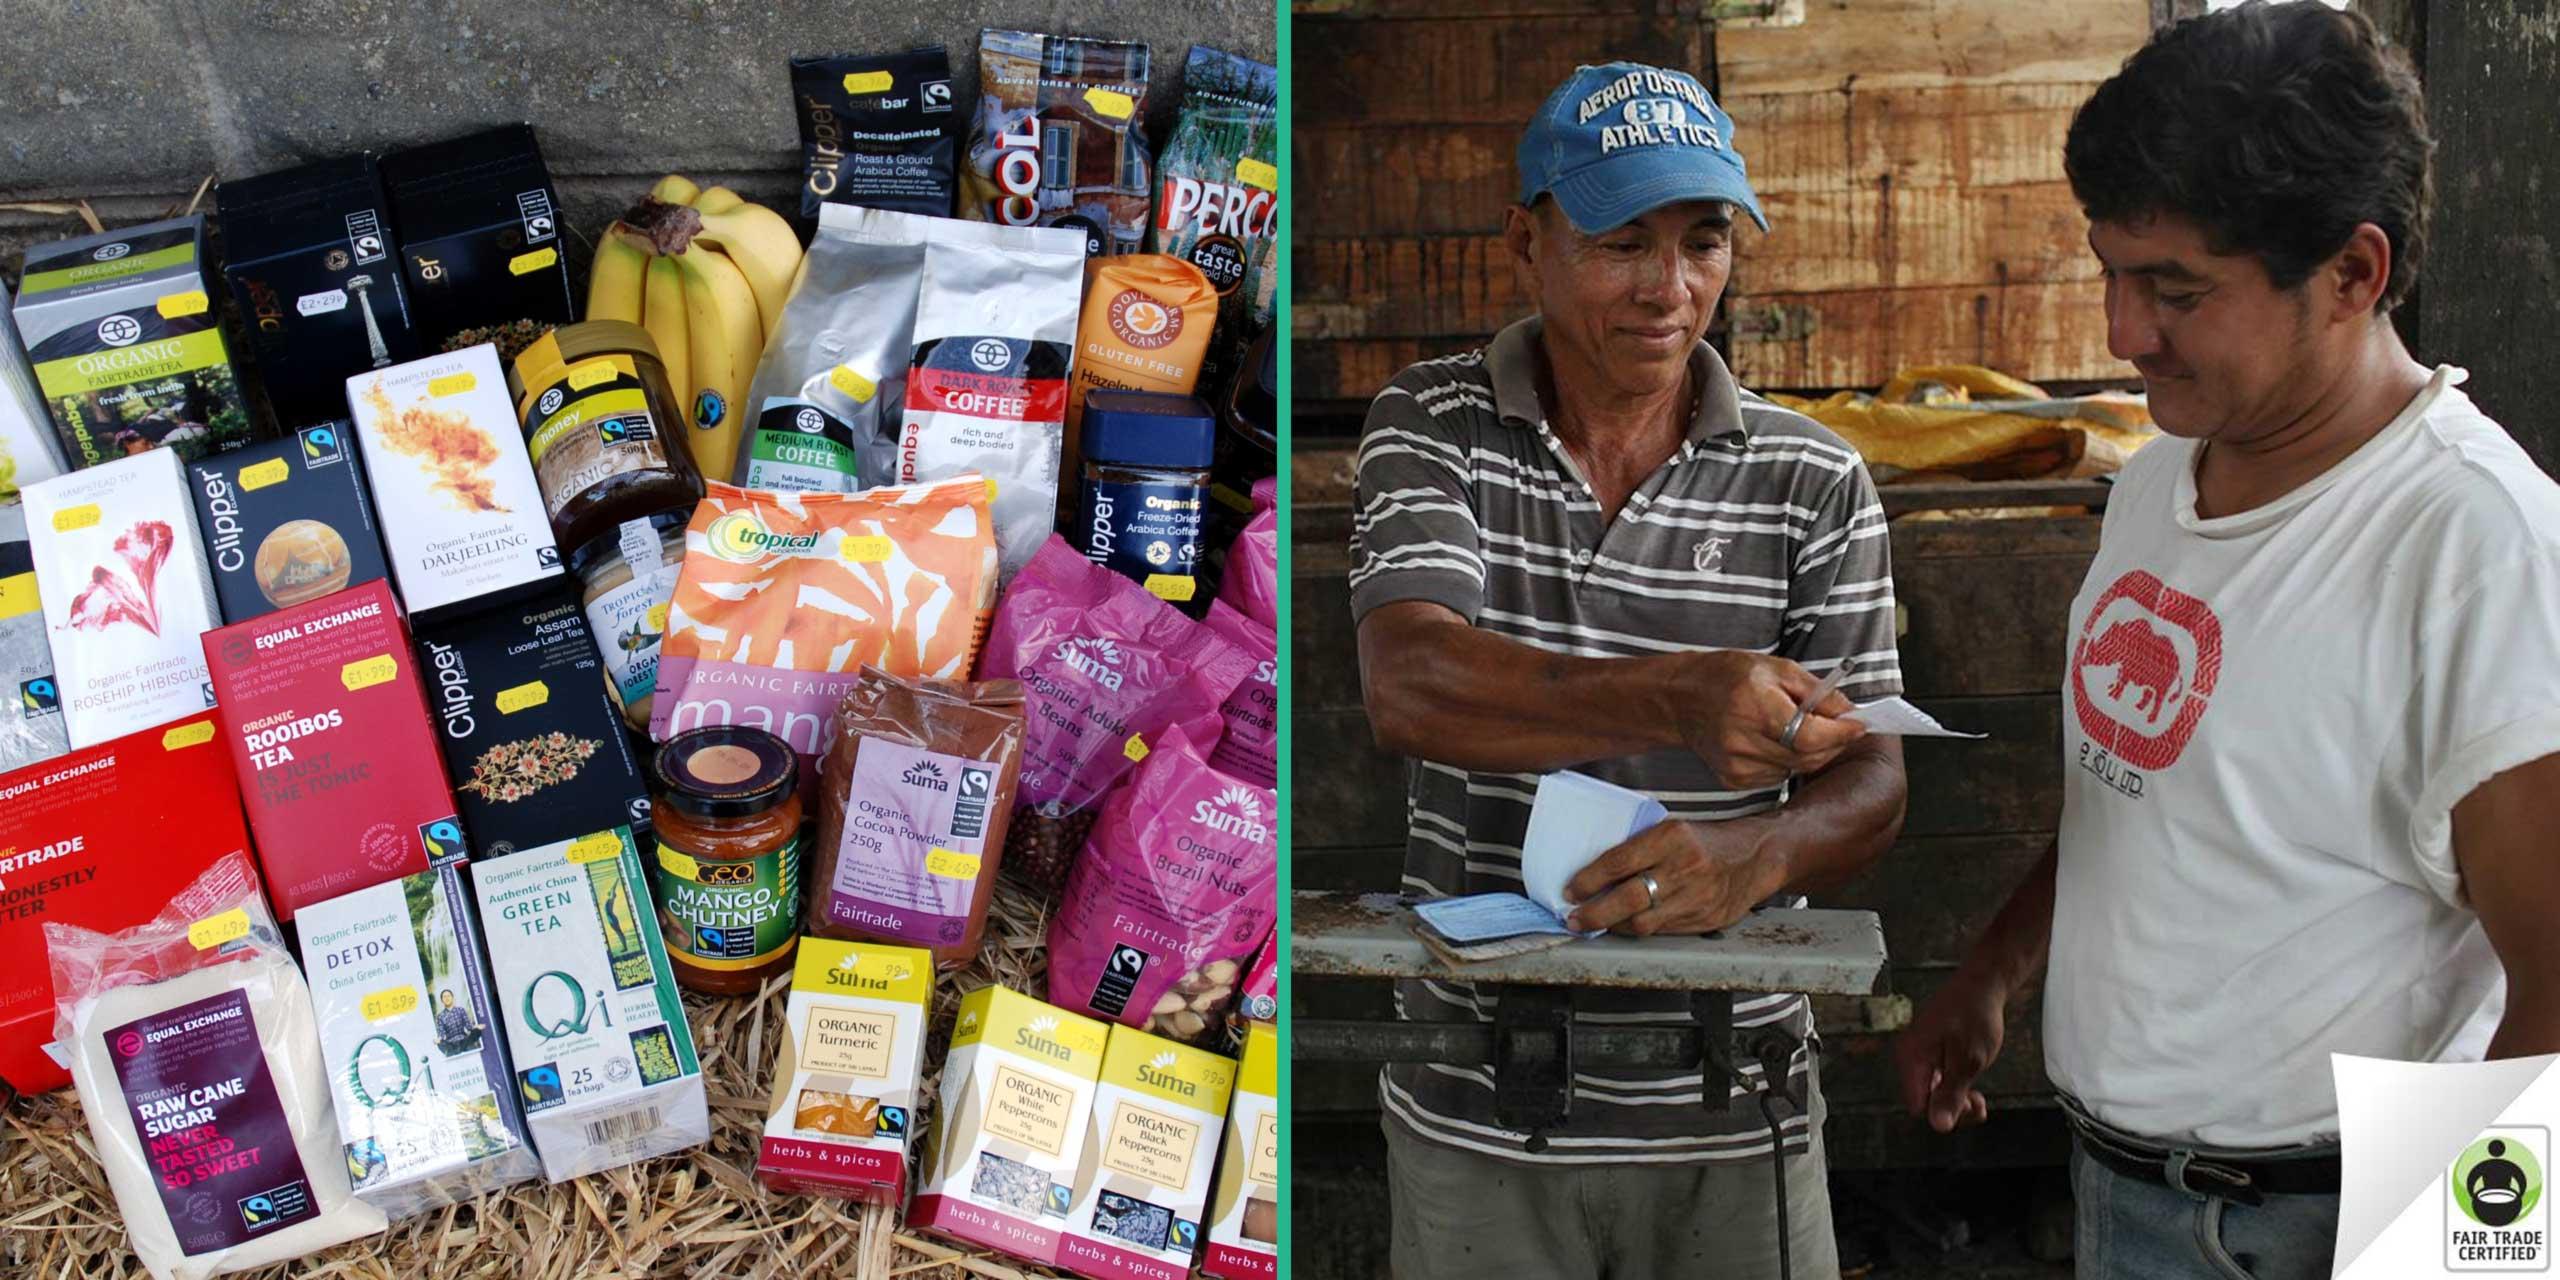 http://staging.skoll.org/wp-content/uploads/2014/03/fair-trade-sl2.jpg